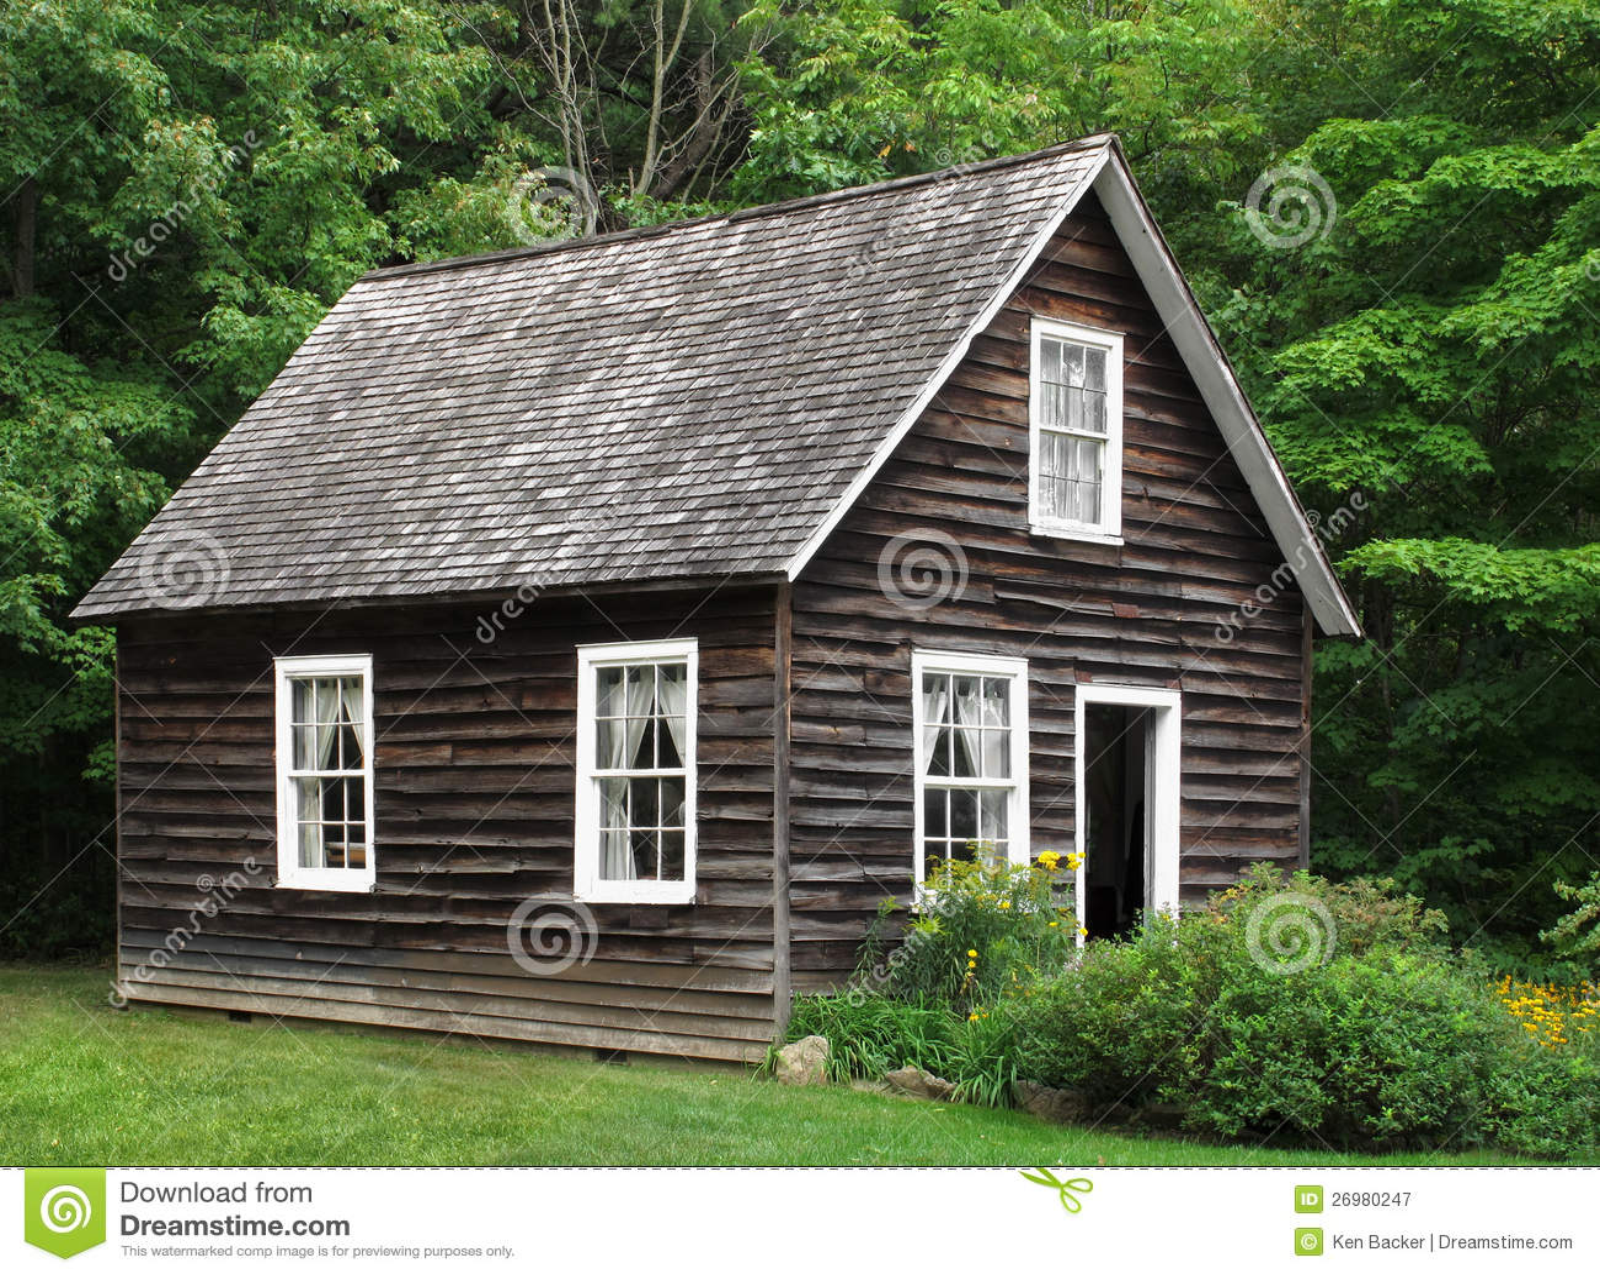 Peque a casa de madera r stica en rboles imagen de archivo imagen de peque o wooden 26980247 - Casa madera pequena ...